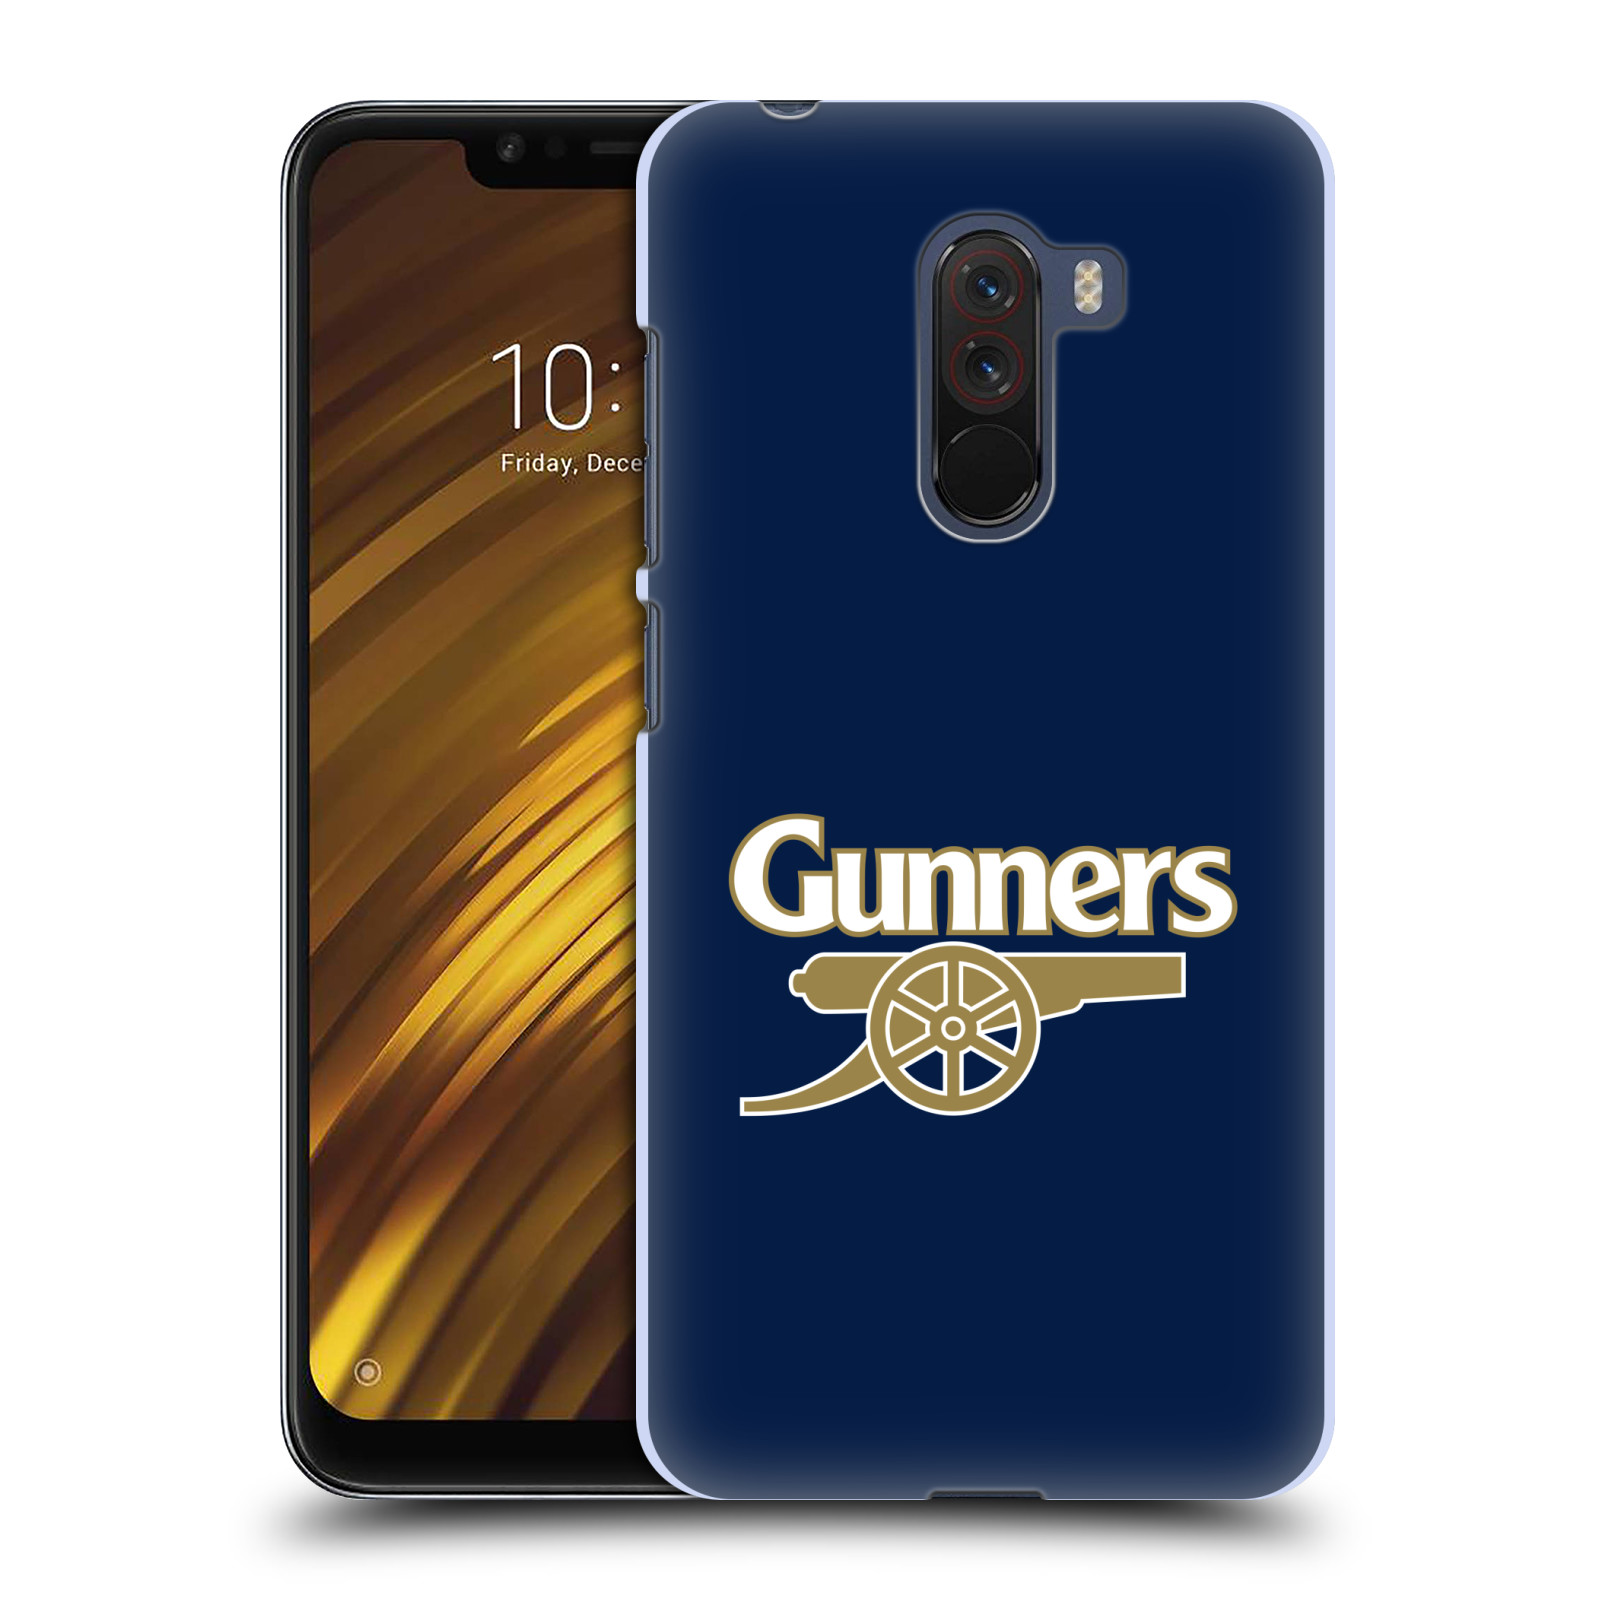 Plastové pouzdro na mobil Xiaomi Pocophone F1 - Head Case - Arsenal FC - Gunners